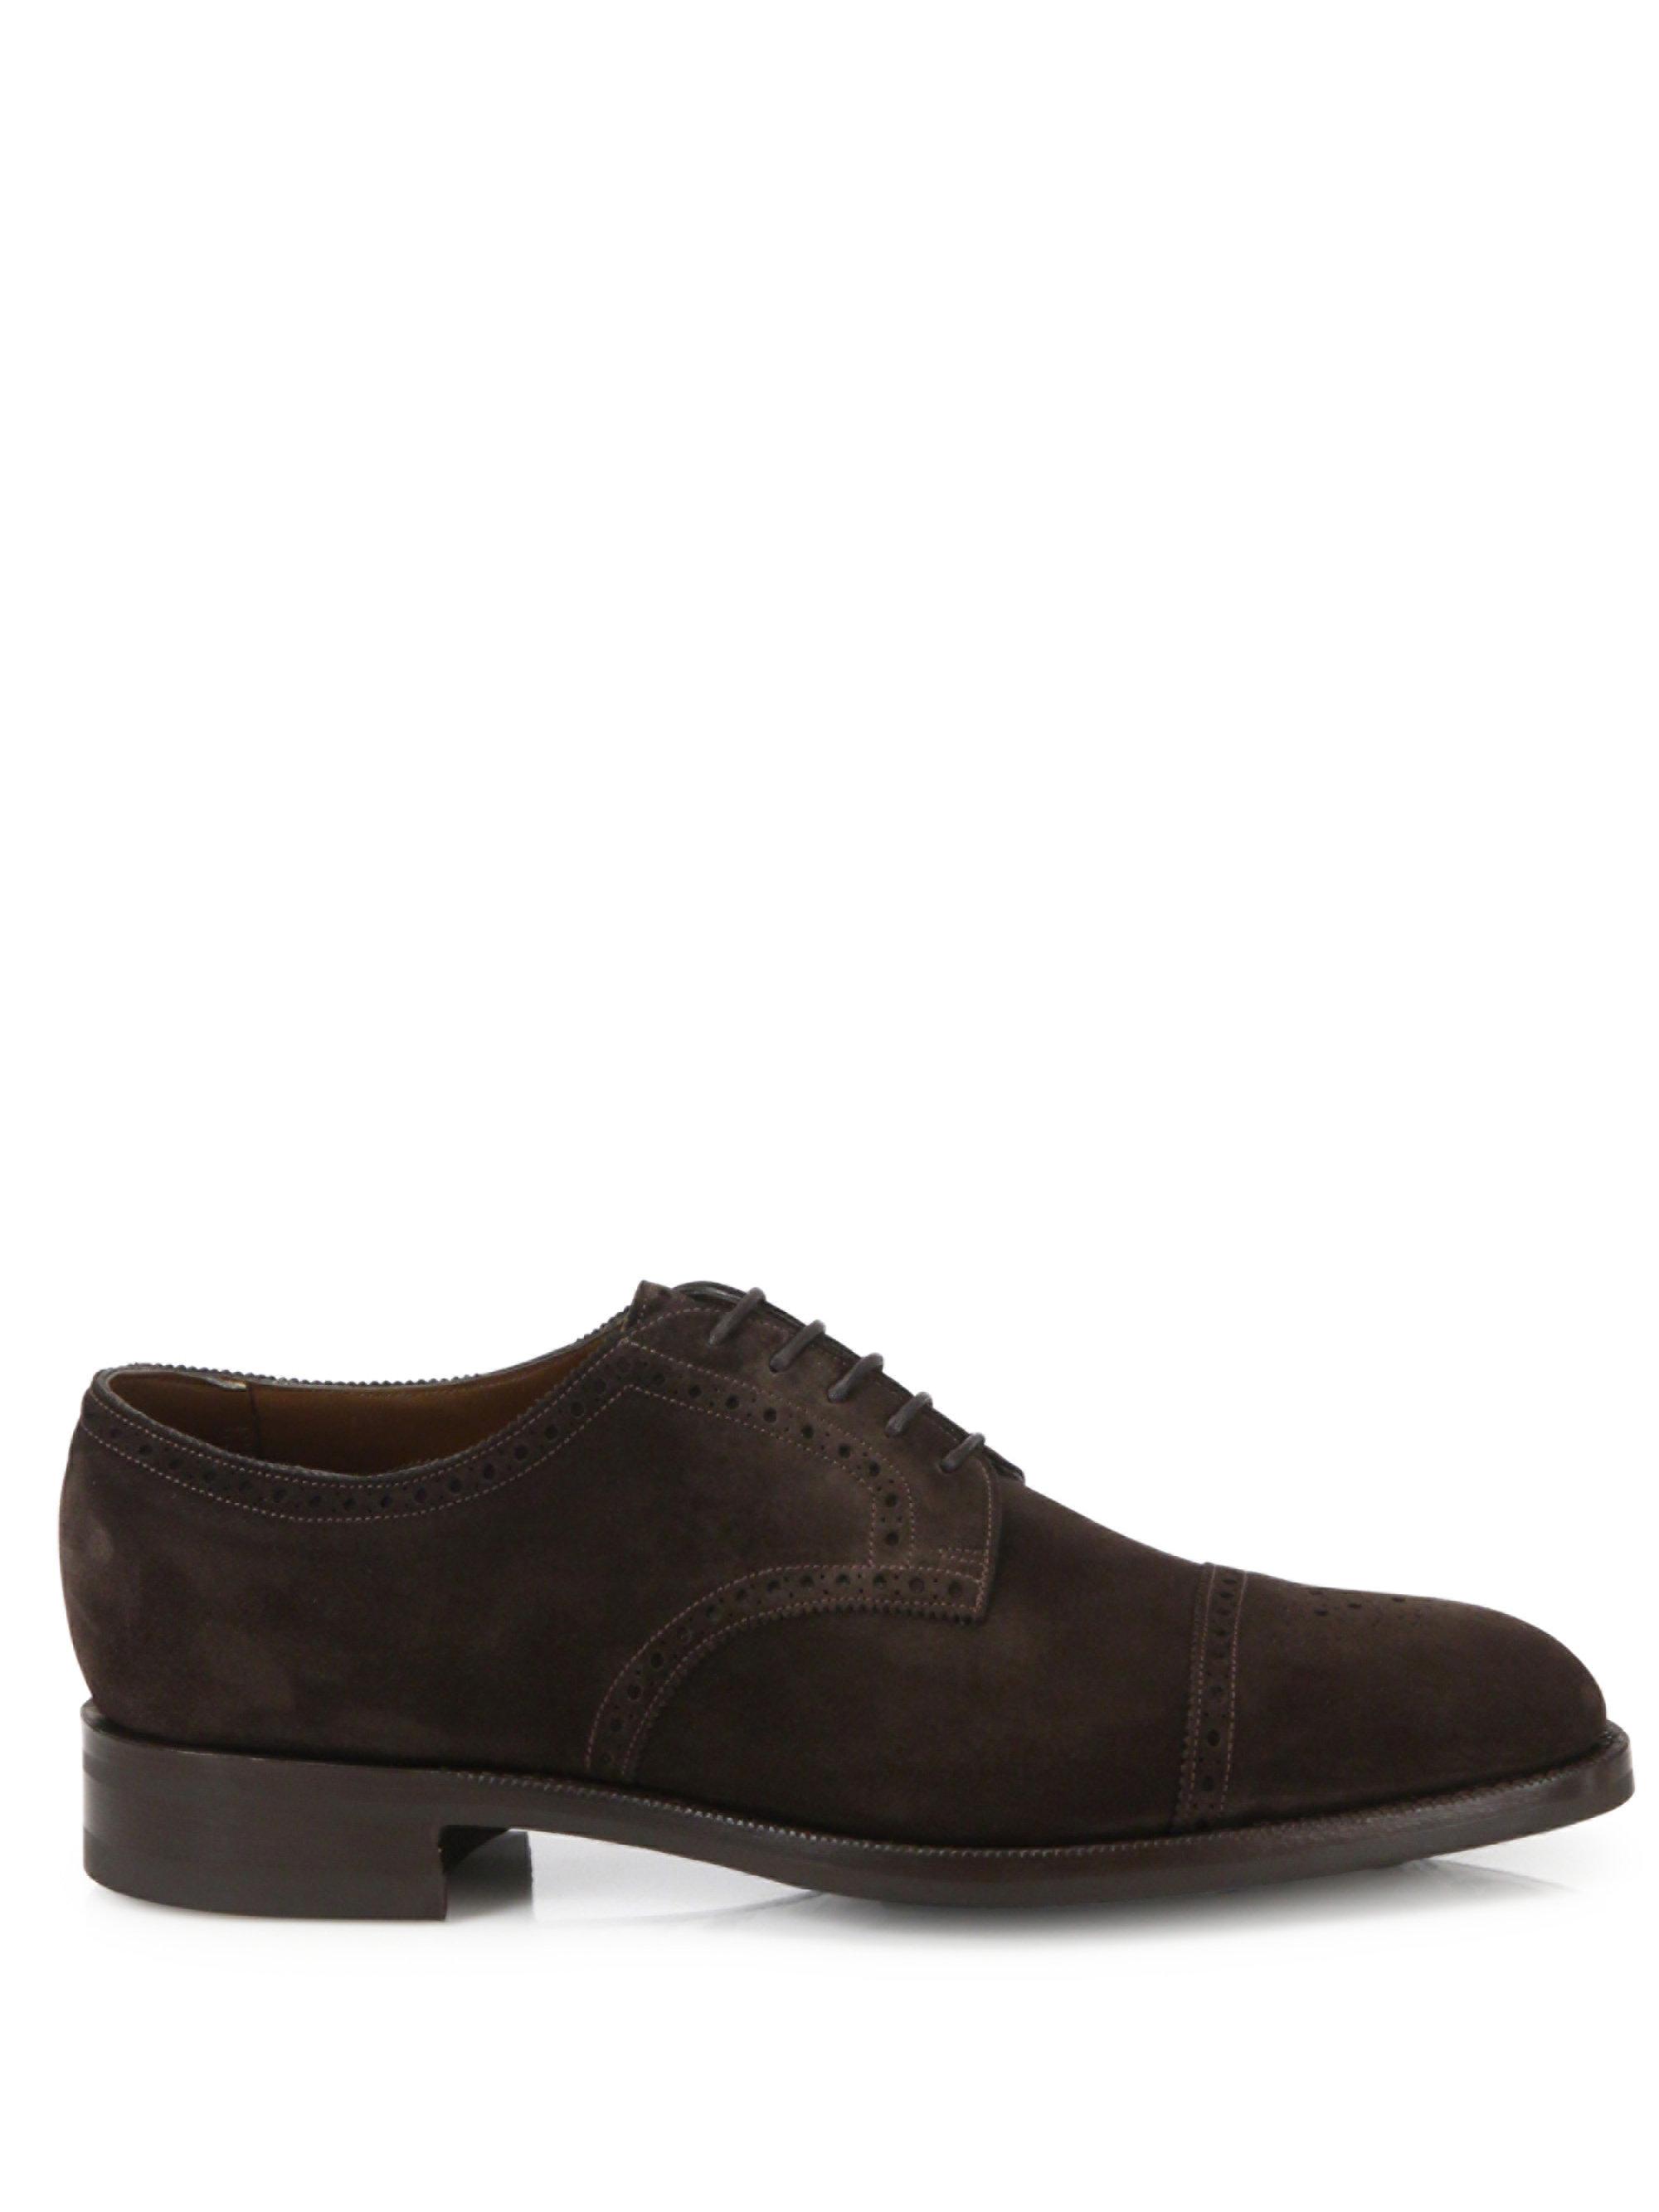 Nordstrom Men S Shoes Cole Haan Lenox Hill Split Oxford